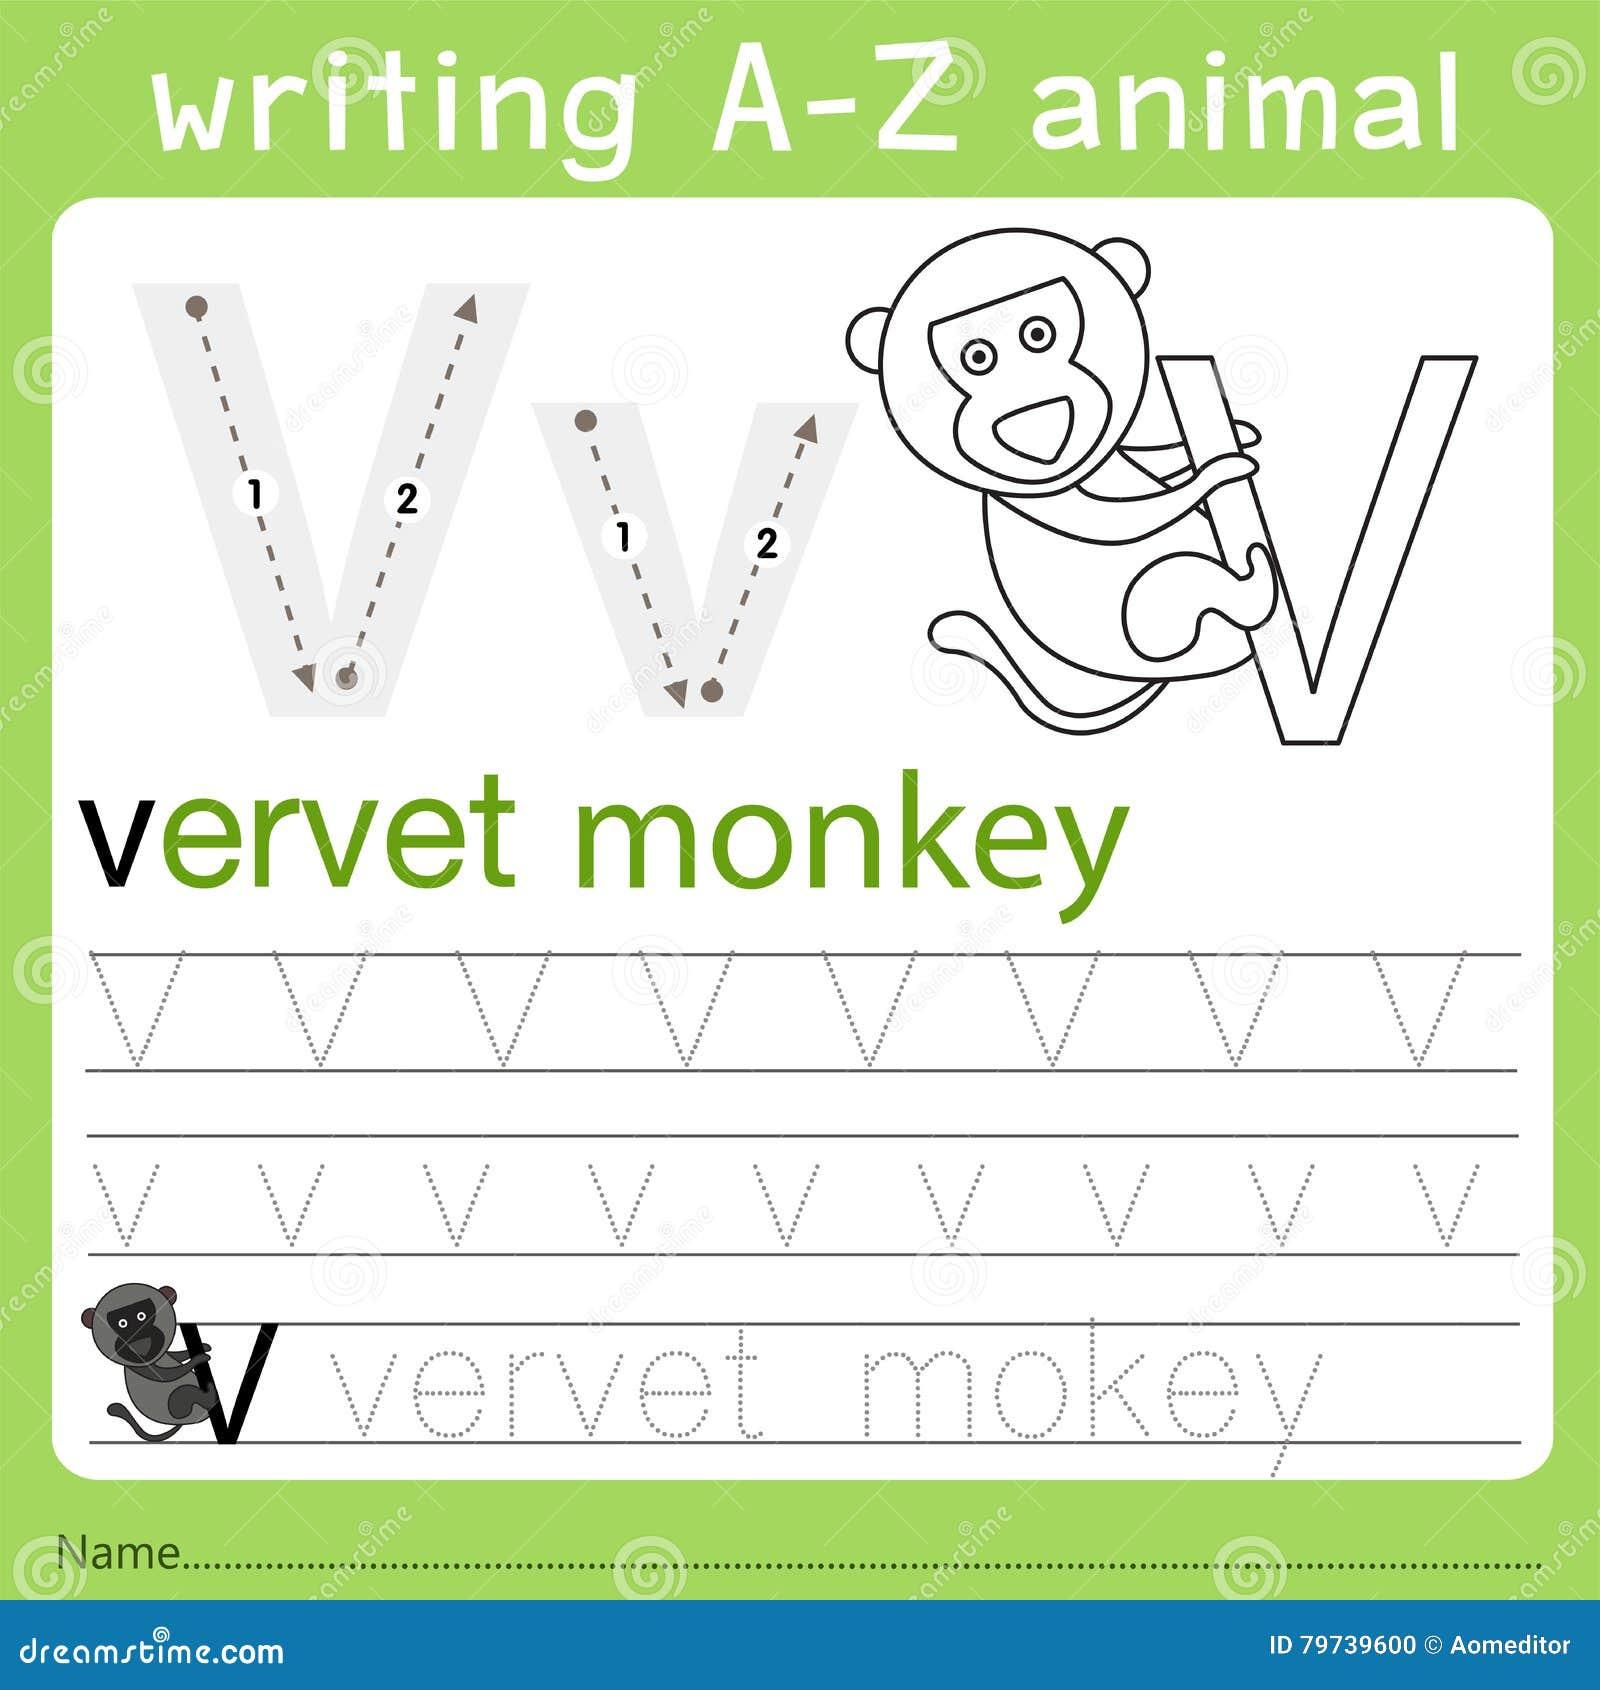 Illustrator del animal del a-z de la escritura v